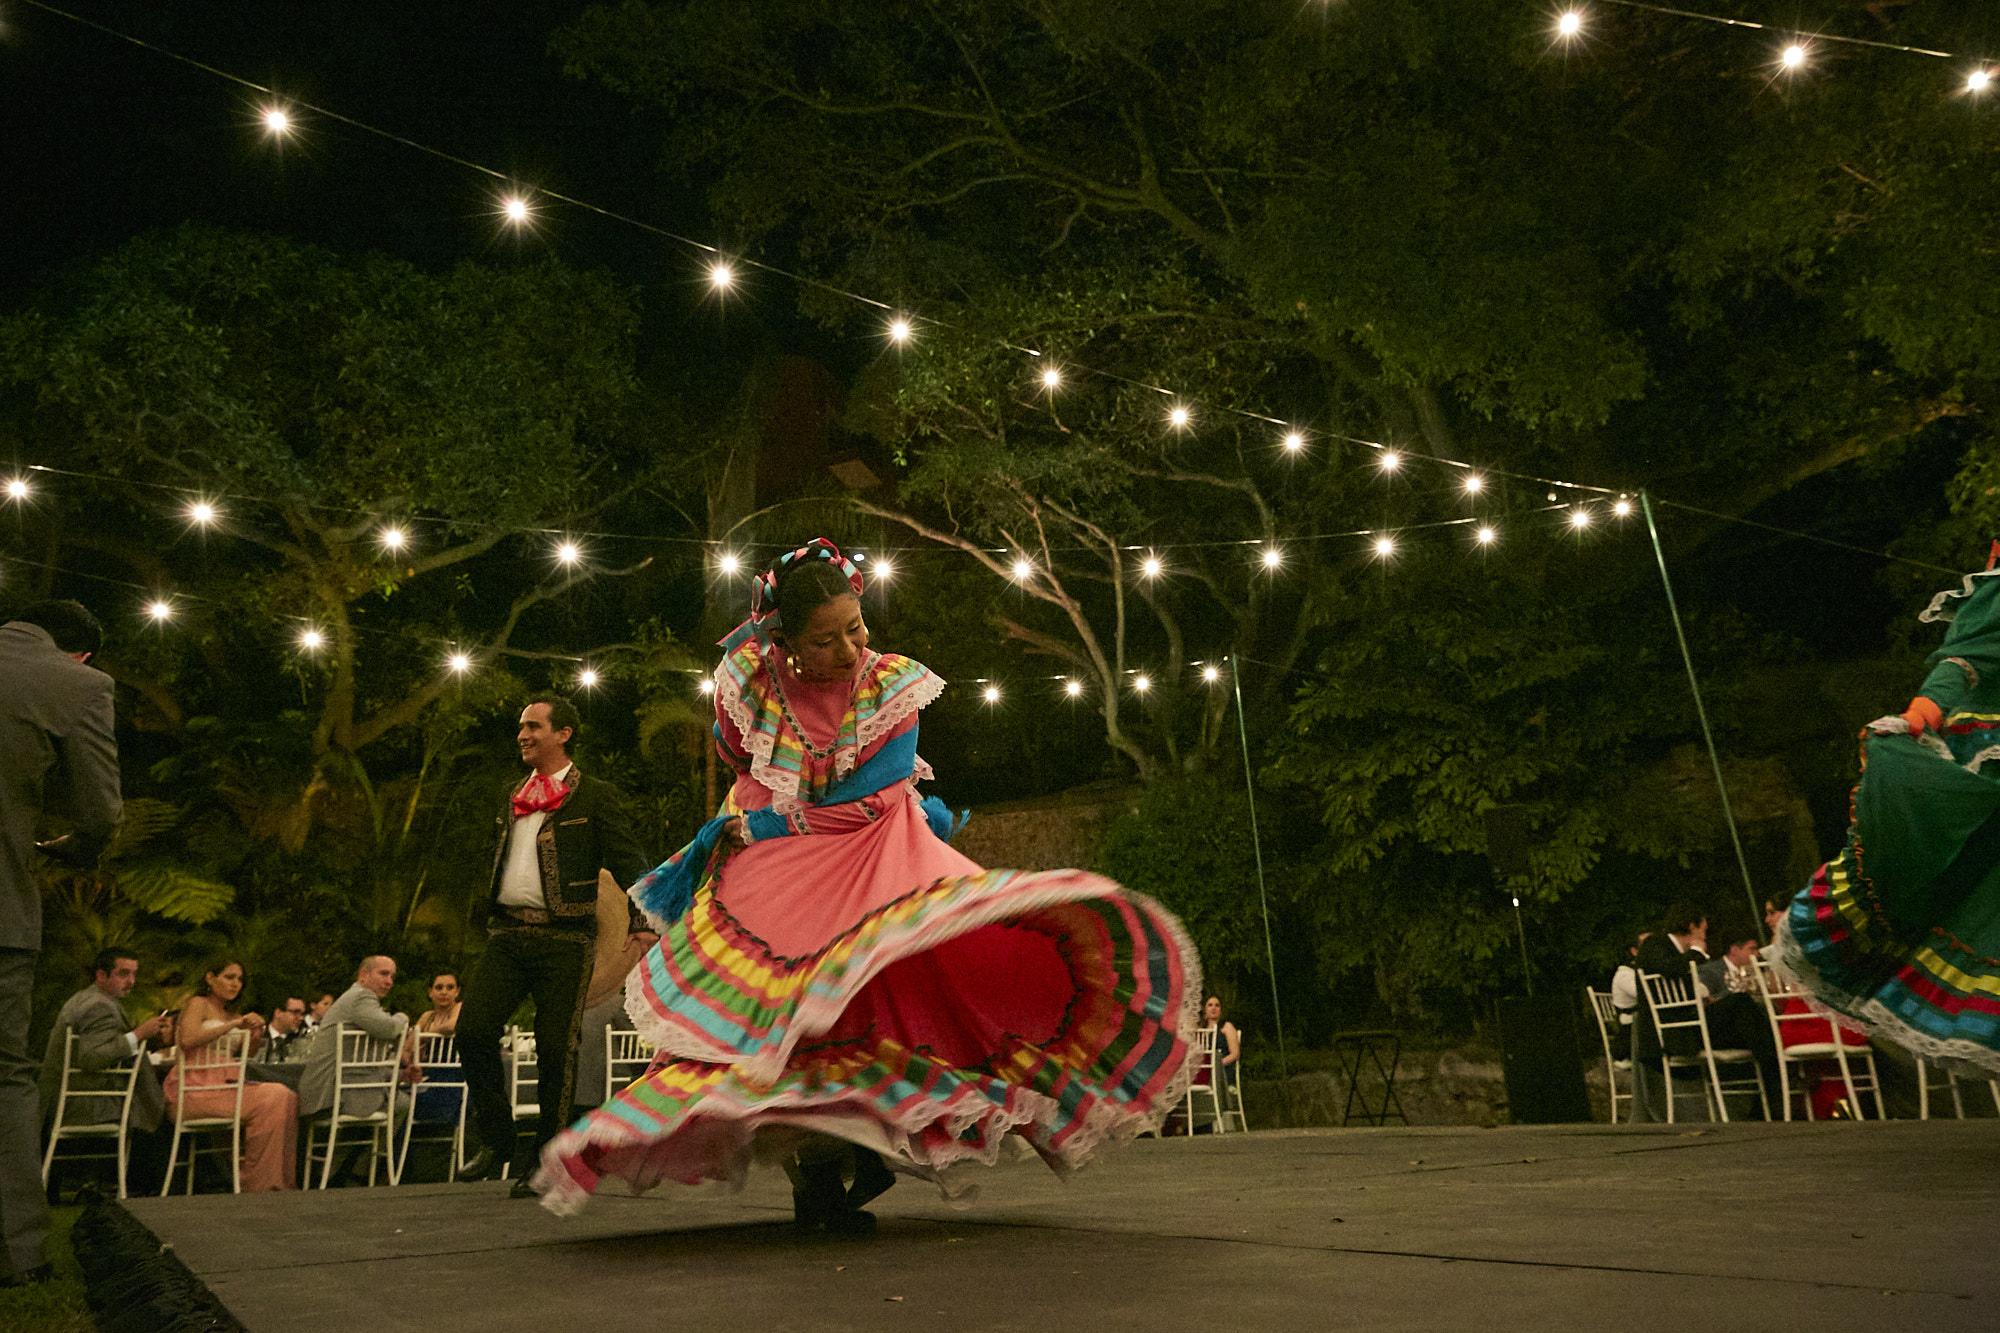 LJL_GabbyandIVan_Mexico_093.jpg